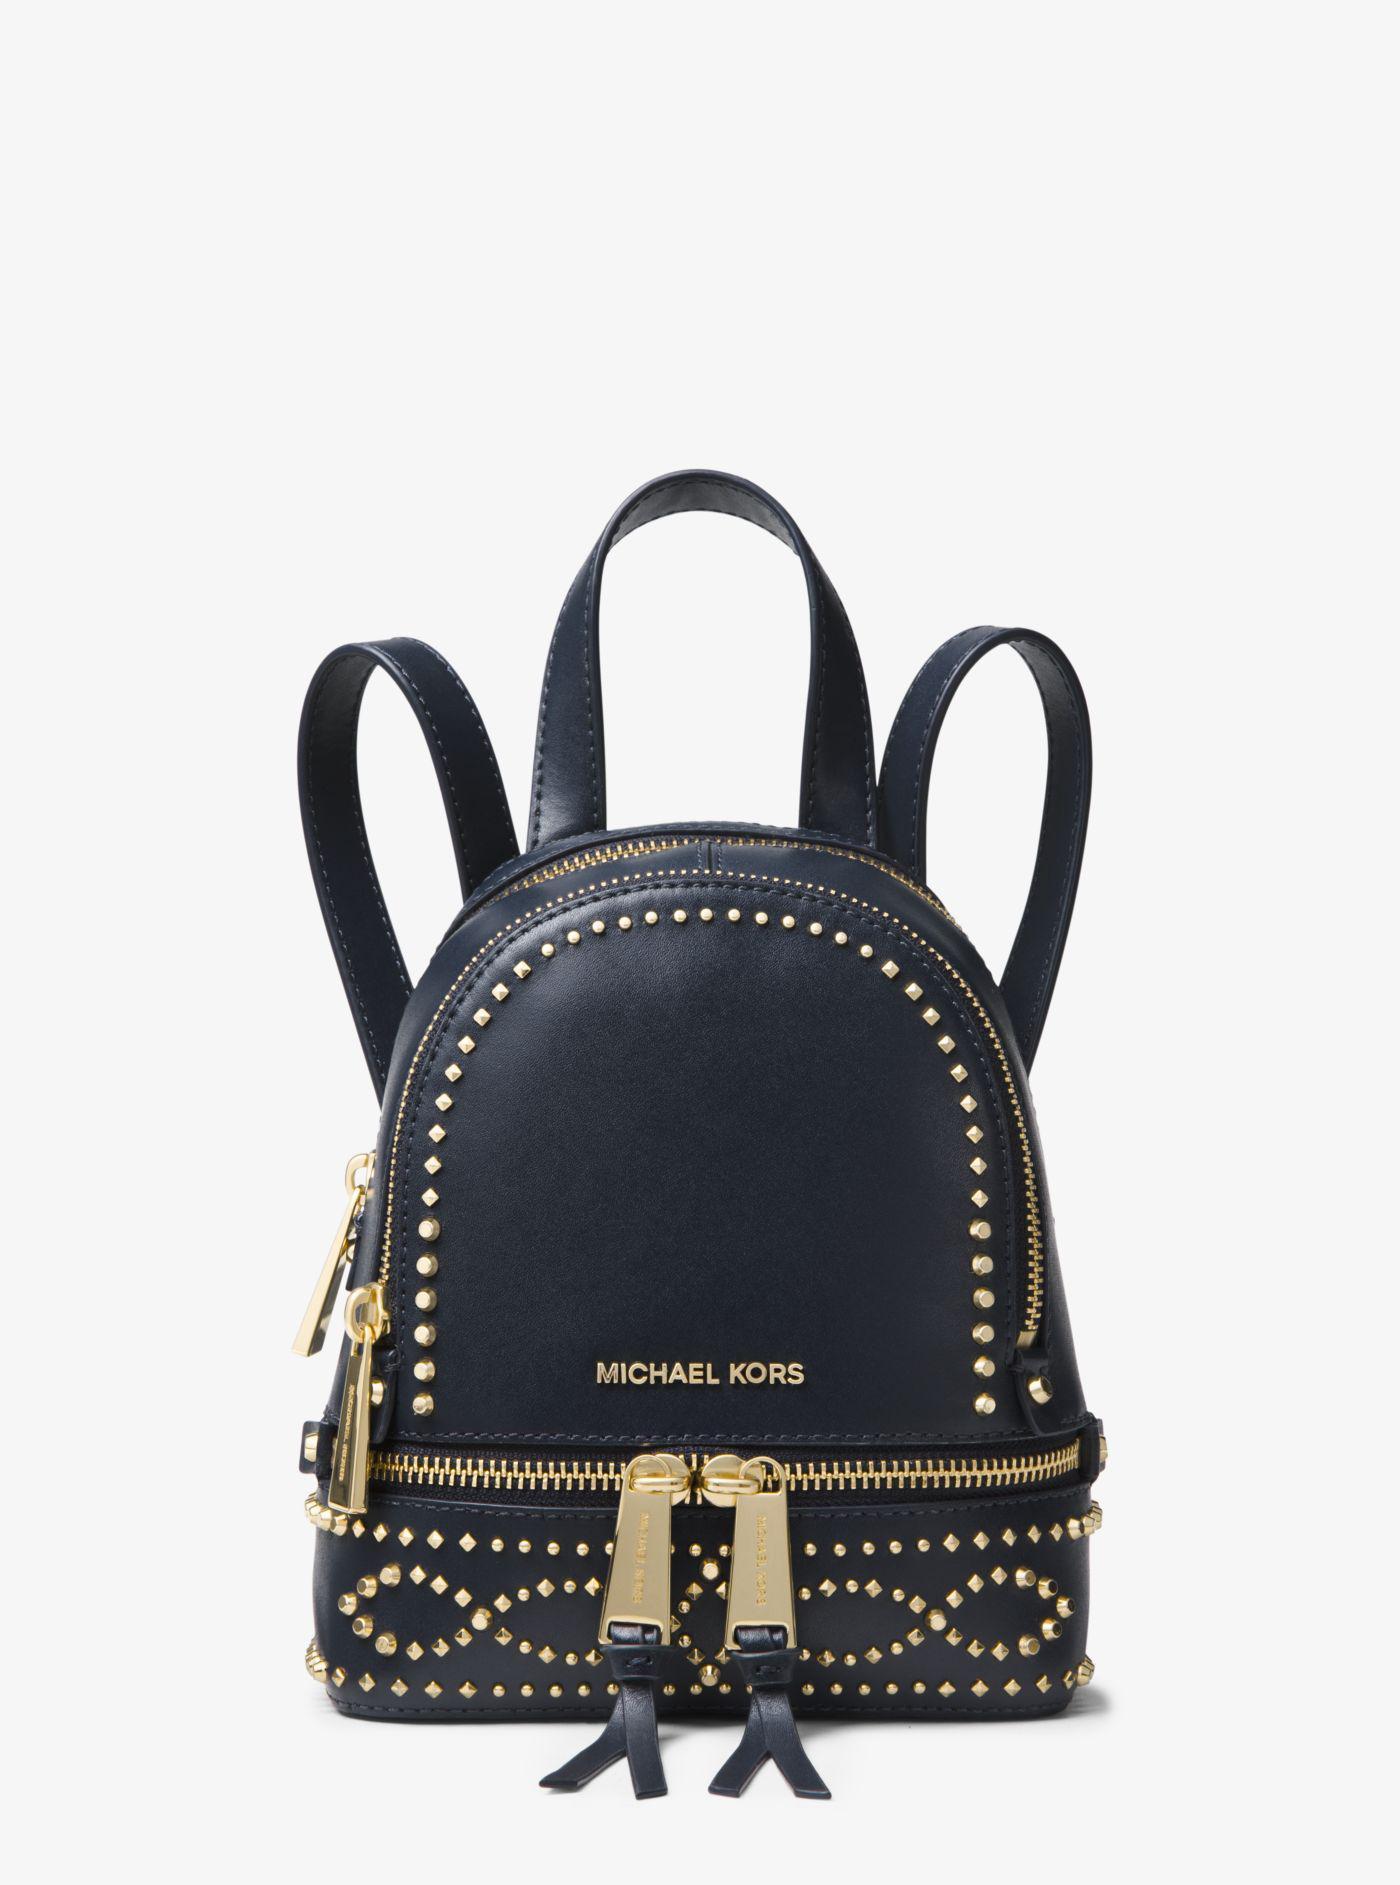 69438fb37a1 Lyst - Michael Kors Rhea Mini Studded Leather Backpack